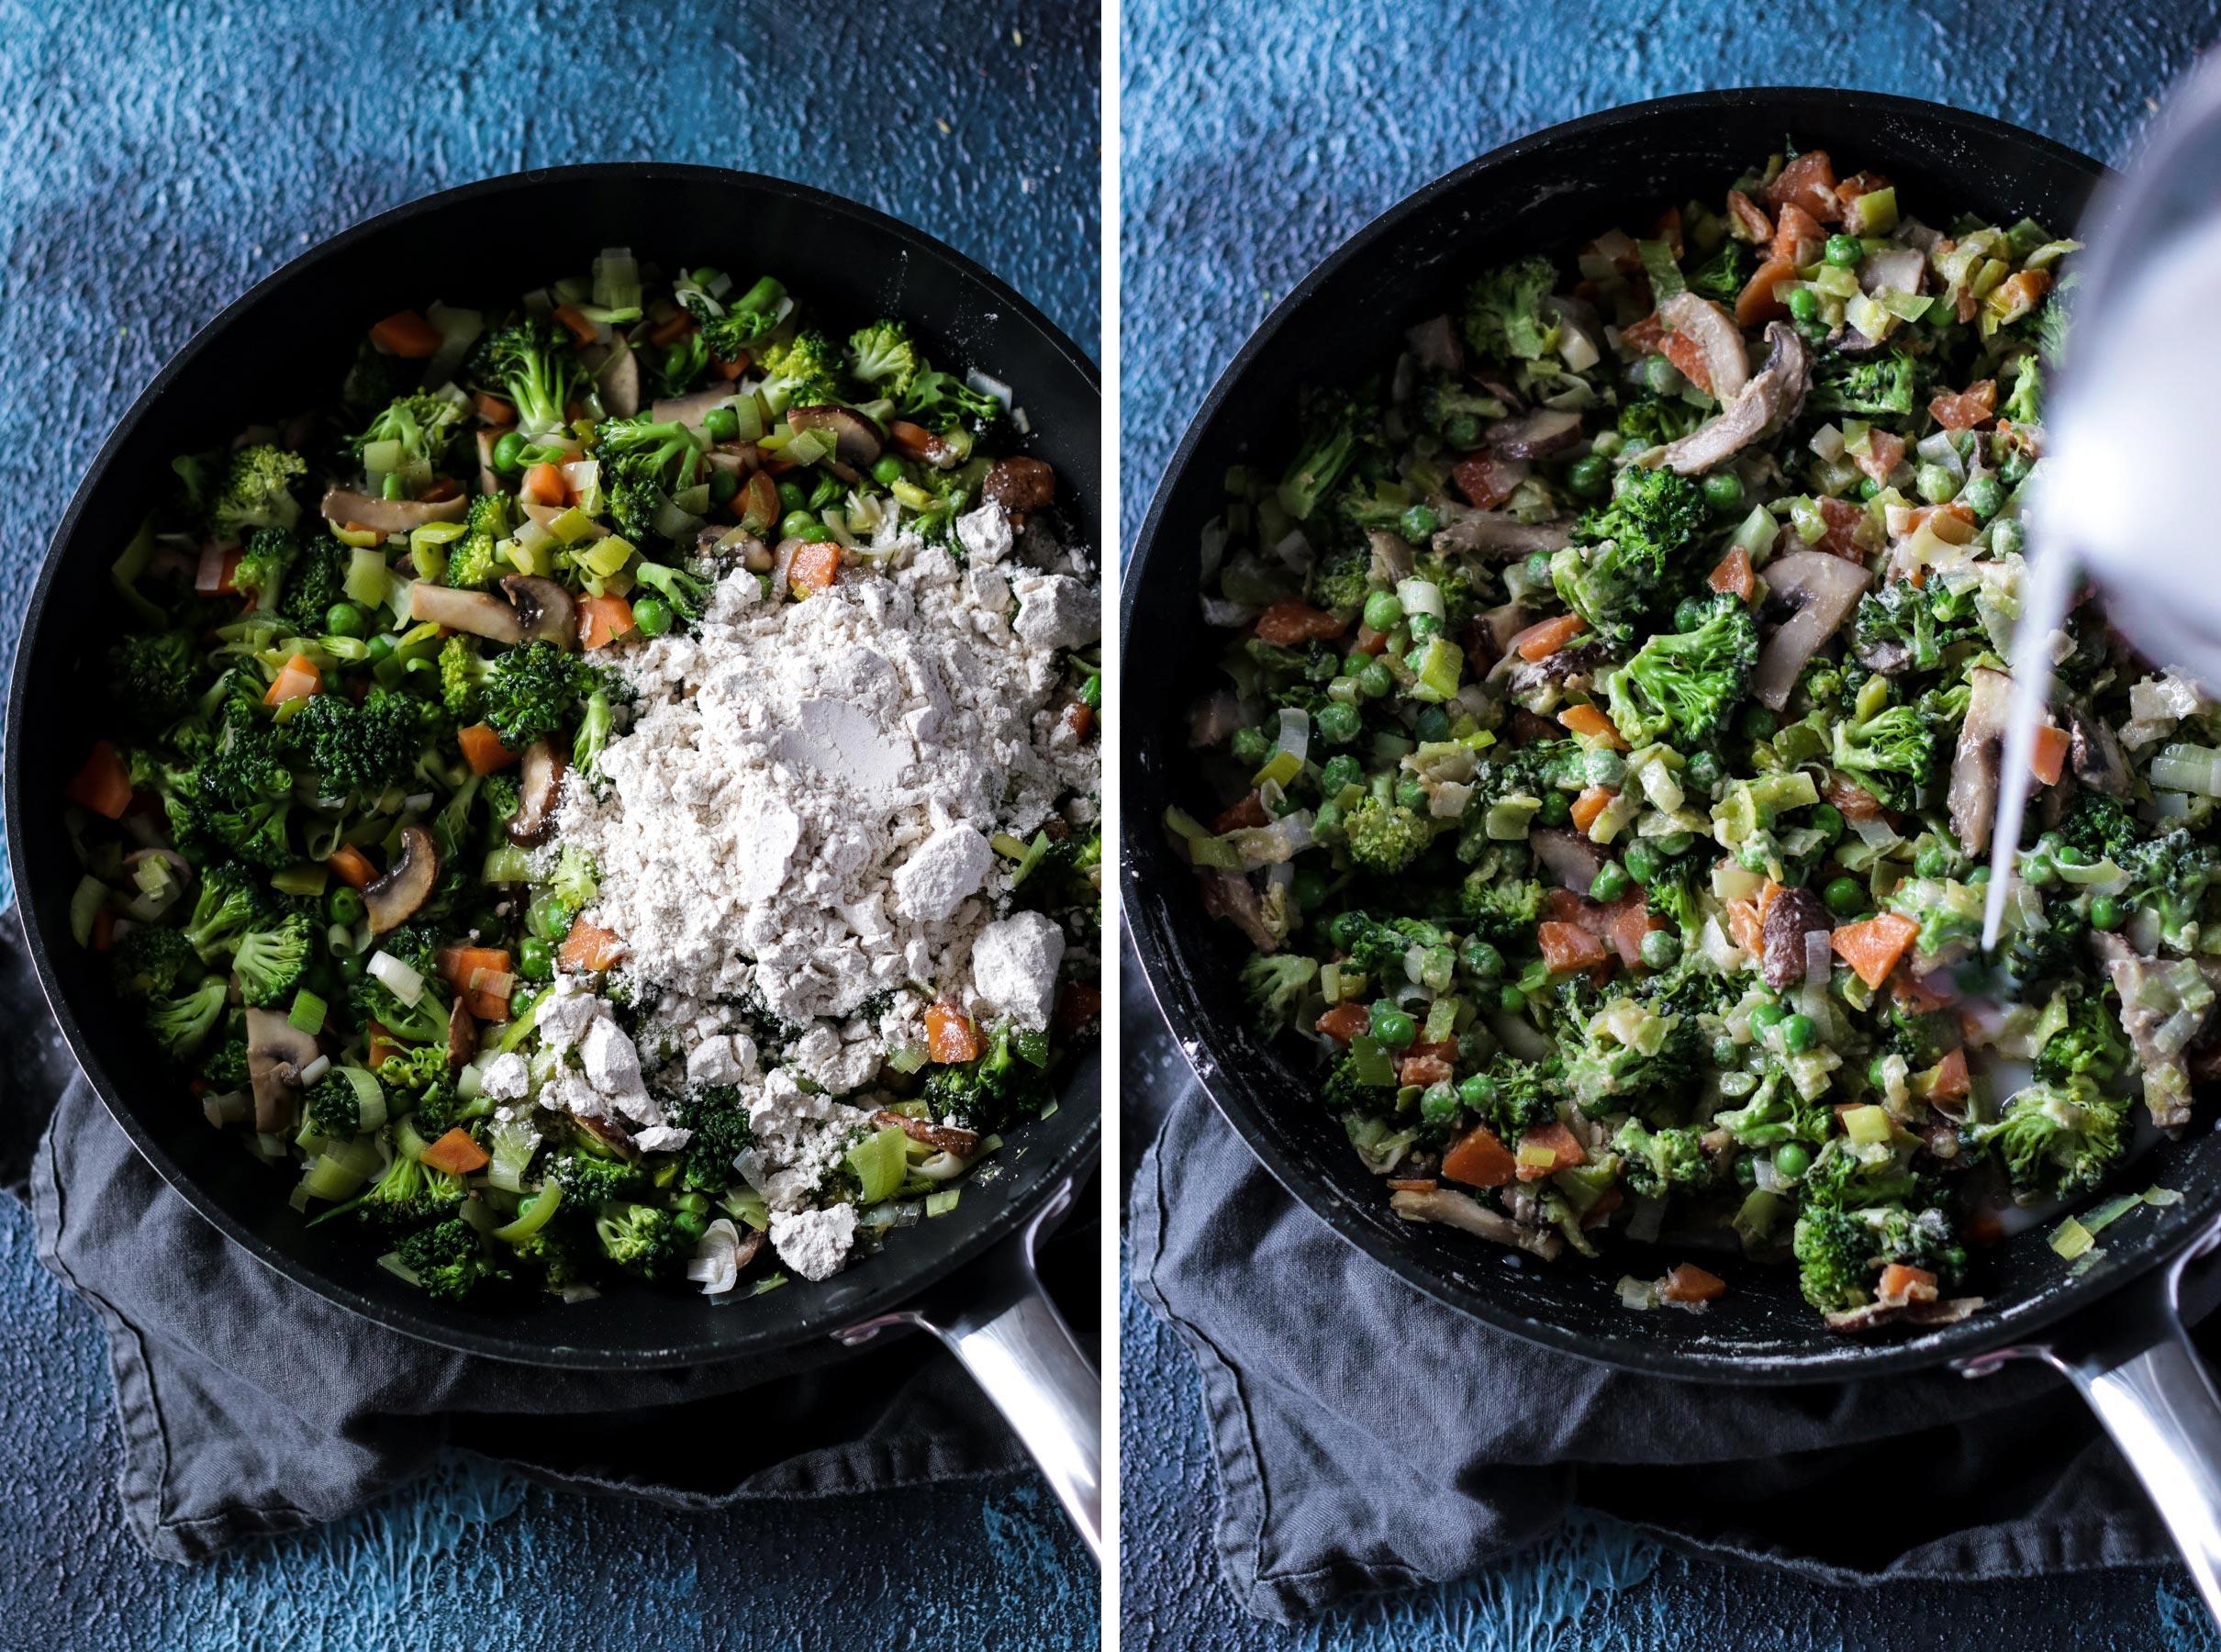 Process shot on how to make vegan bechamel sauce.